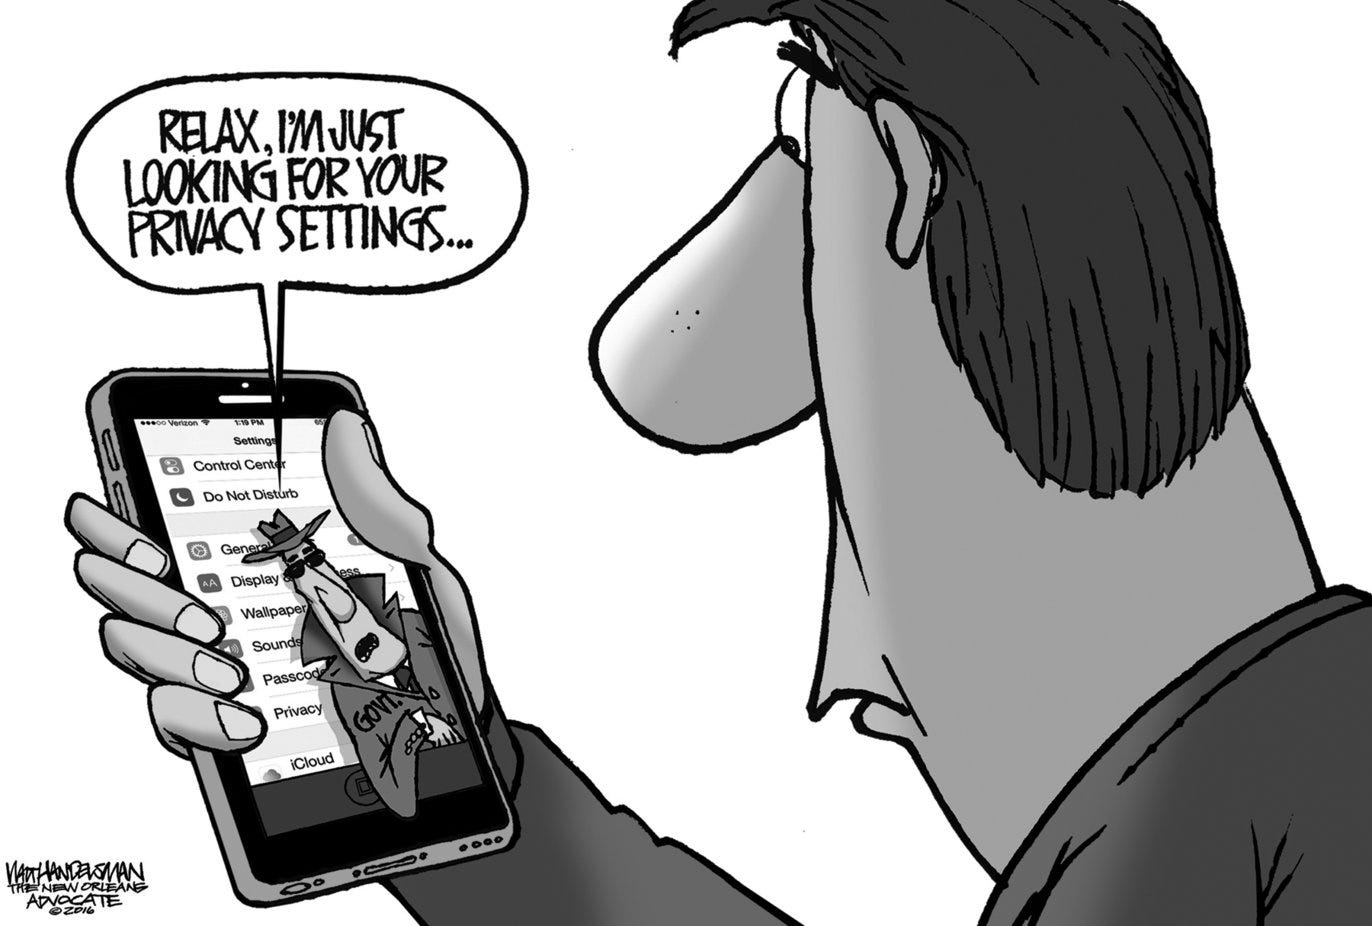 Handelsman, Walt - Editorial Cartoon - 20160228edhan-b.tif ...